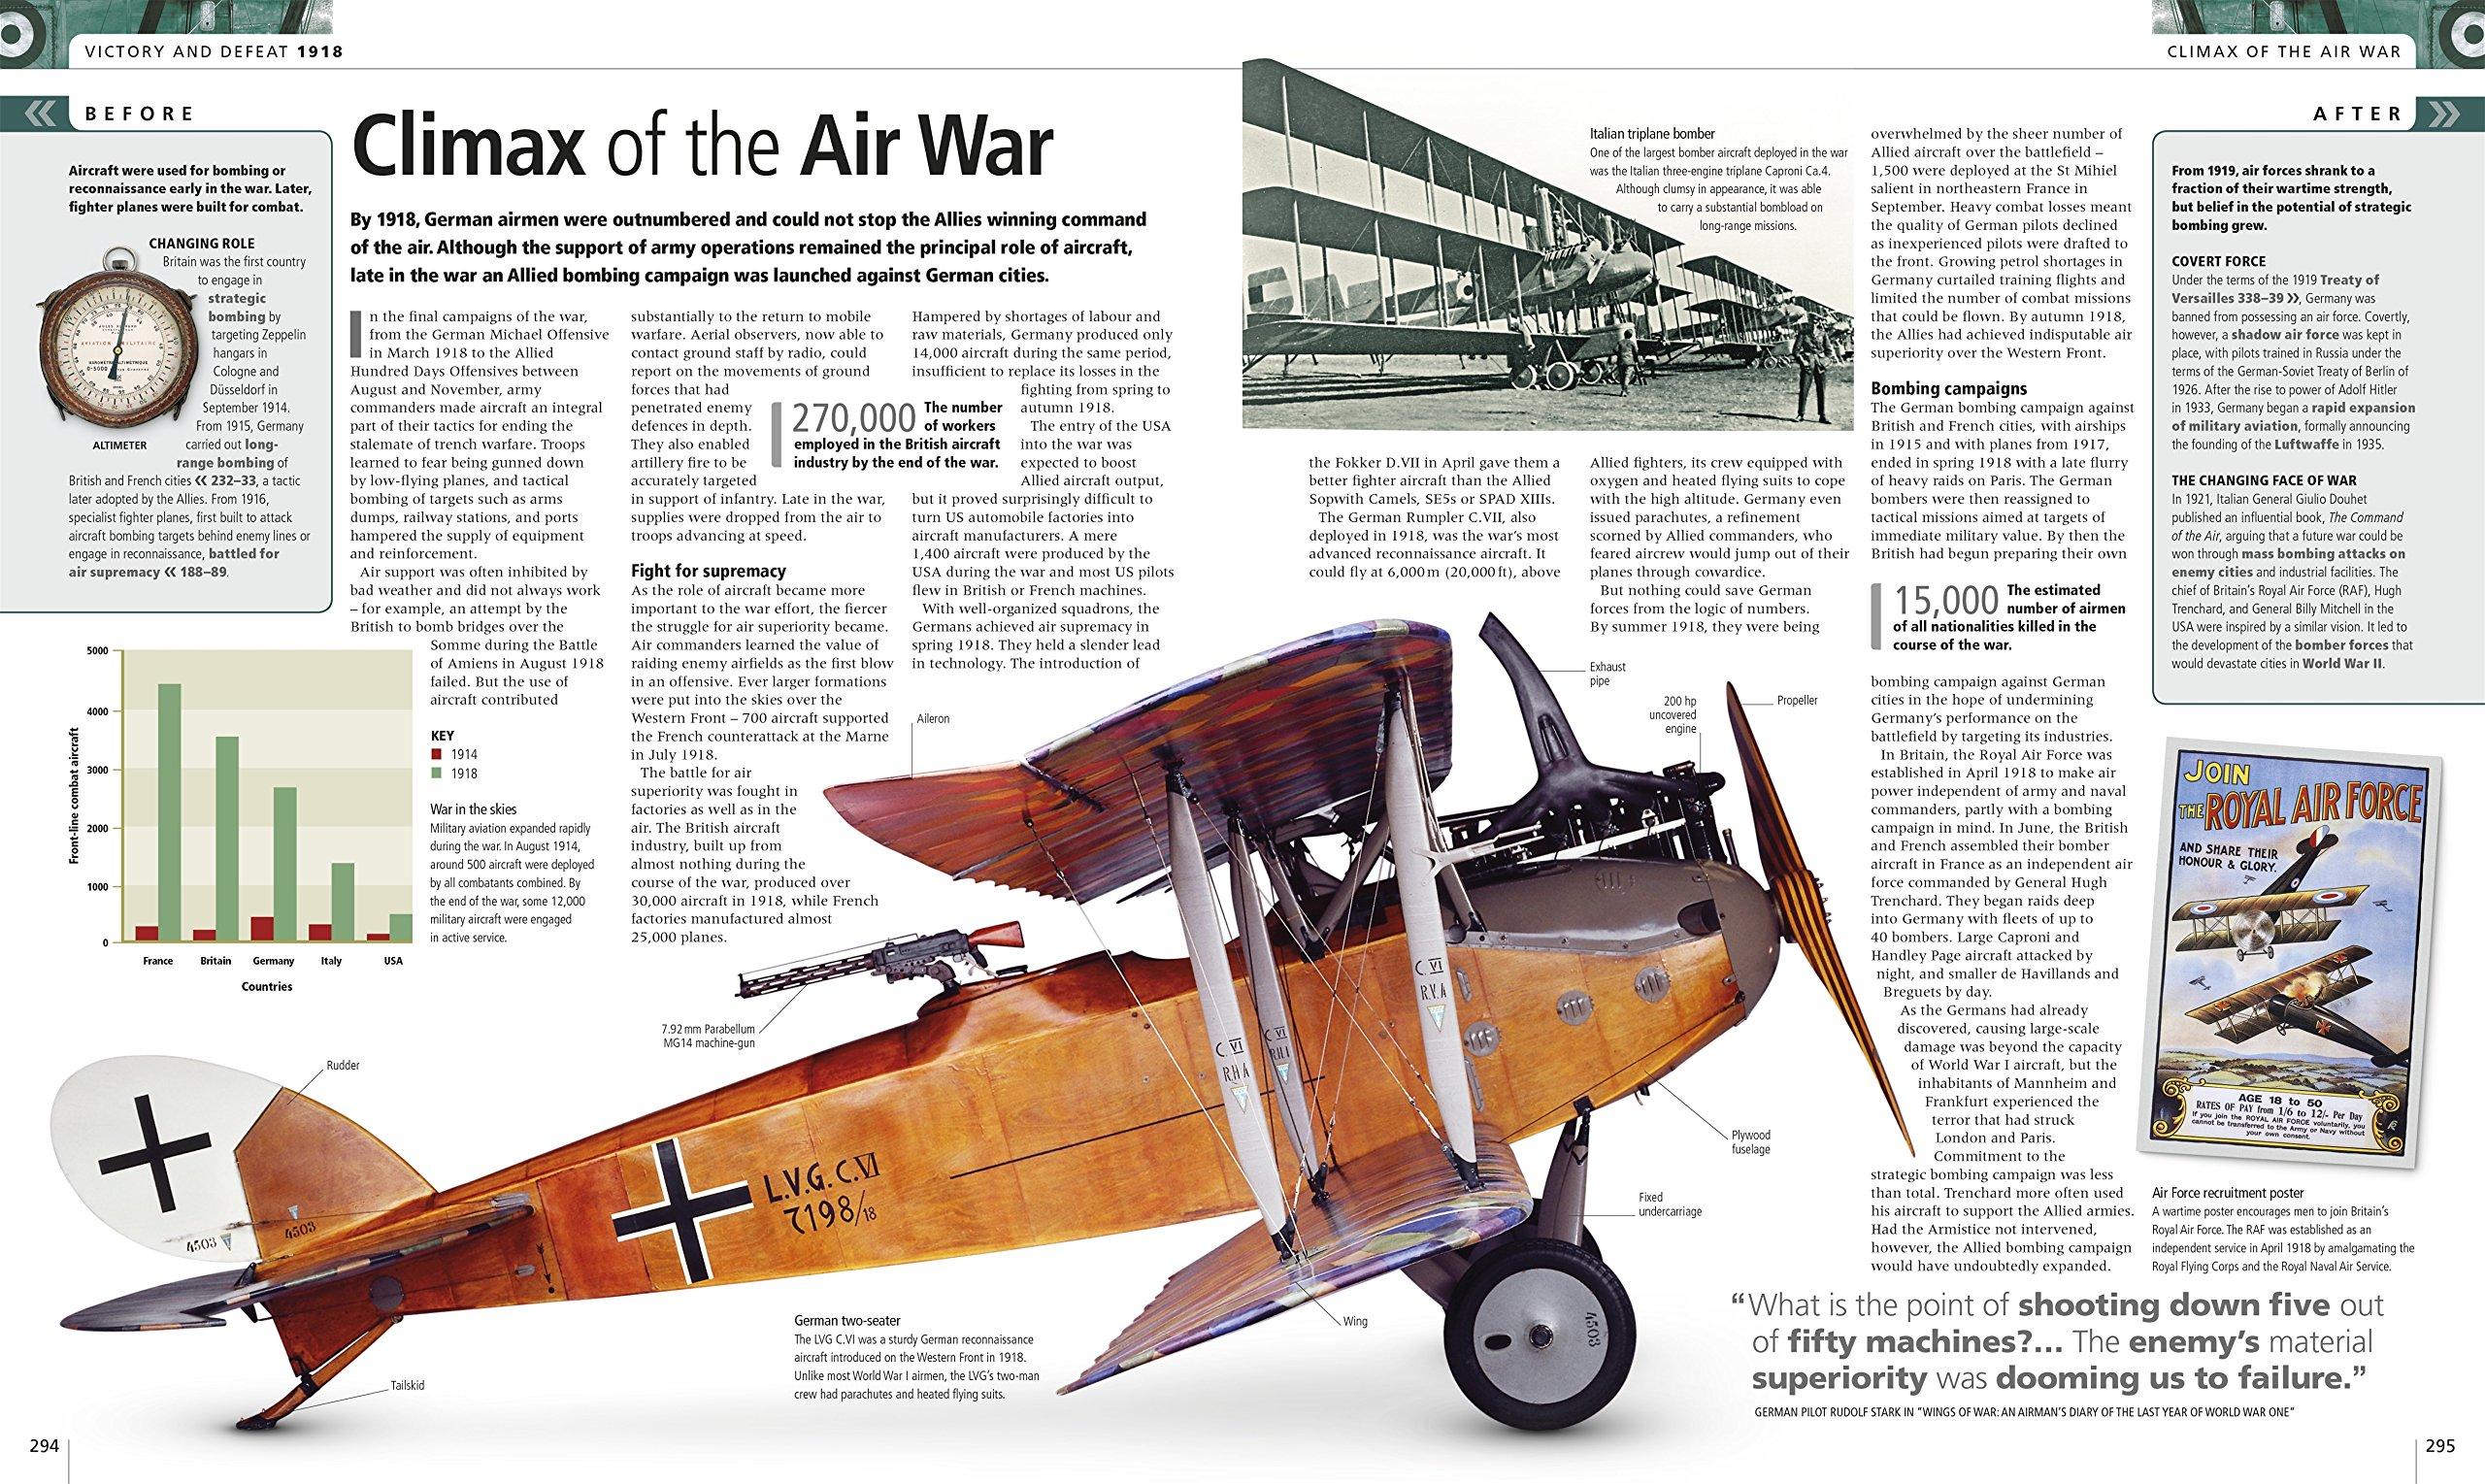 World War I The Definitive Visual History Amazoncouk R G Grant Books